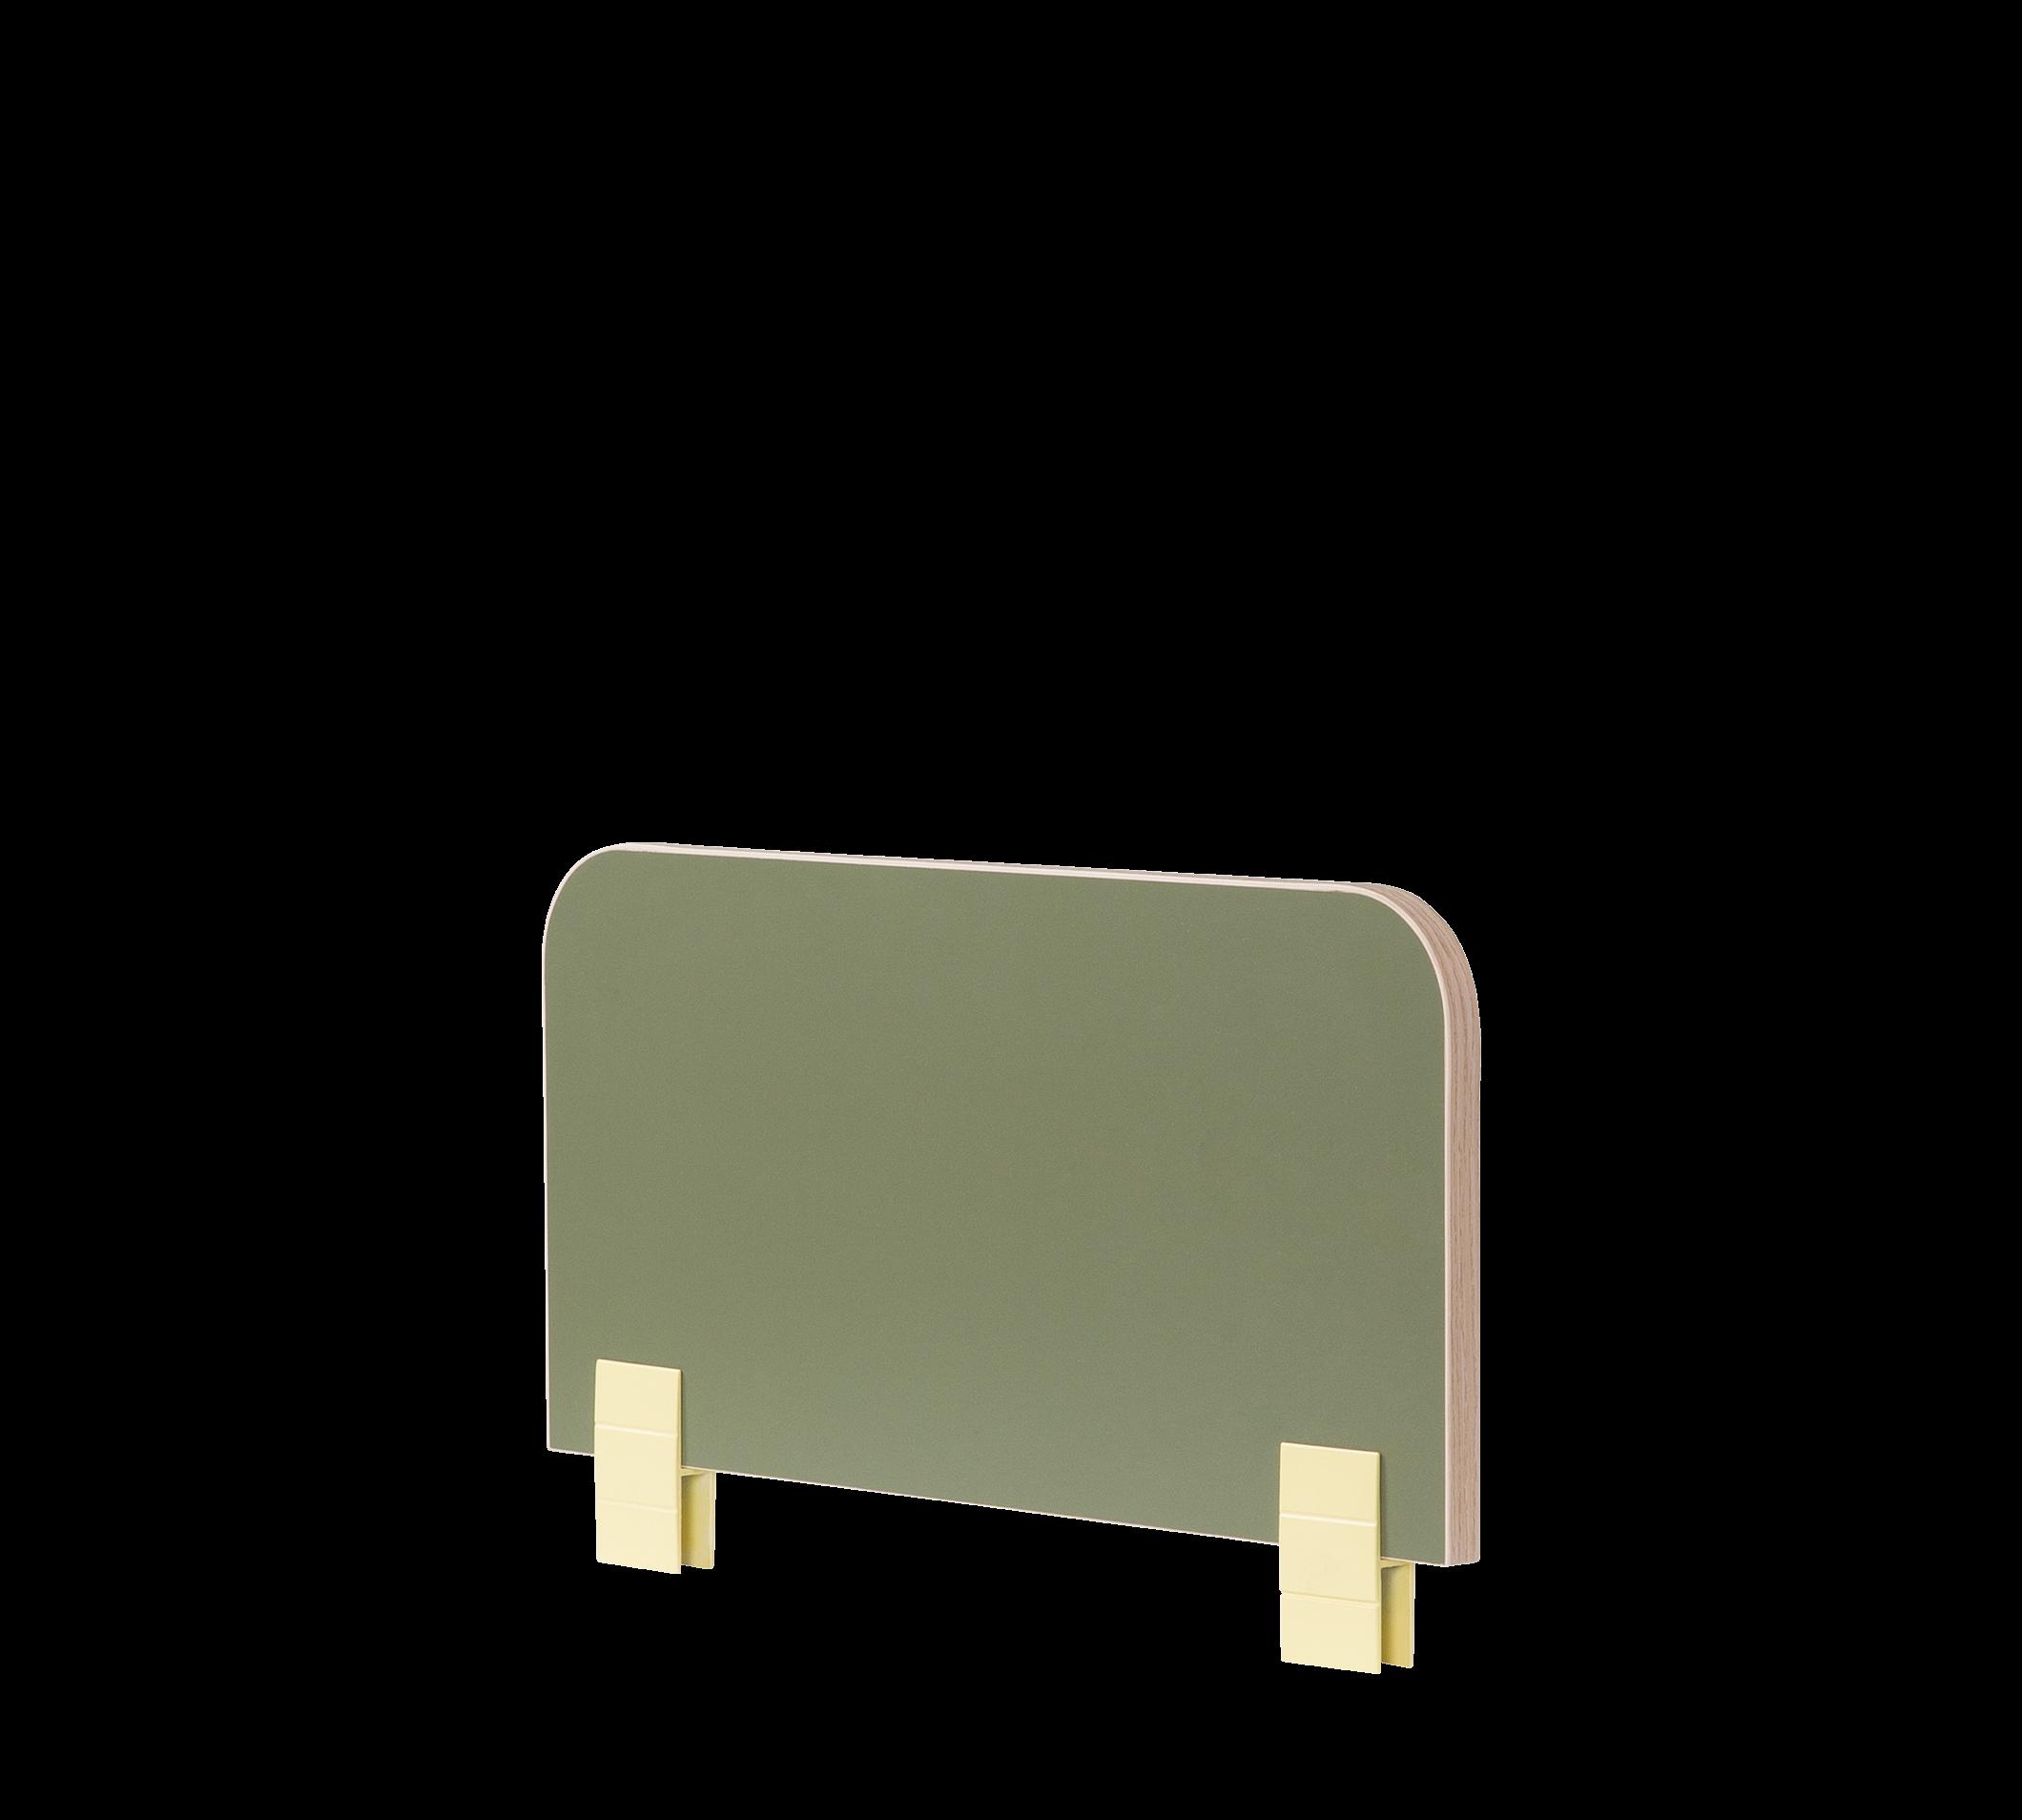 Protectie din pal pentru pat copii Montessori Verde, l50xA2xH29 cm imagine